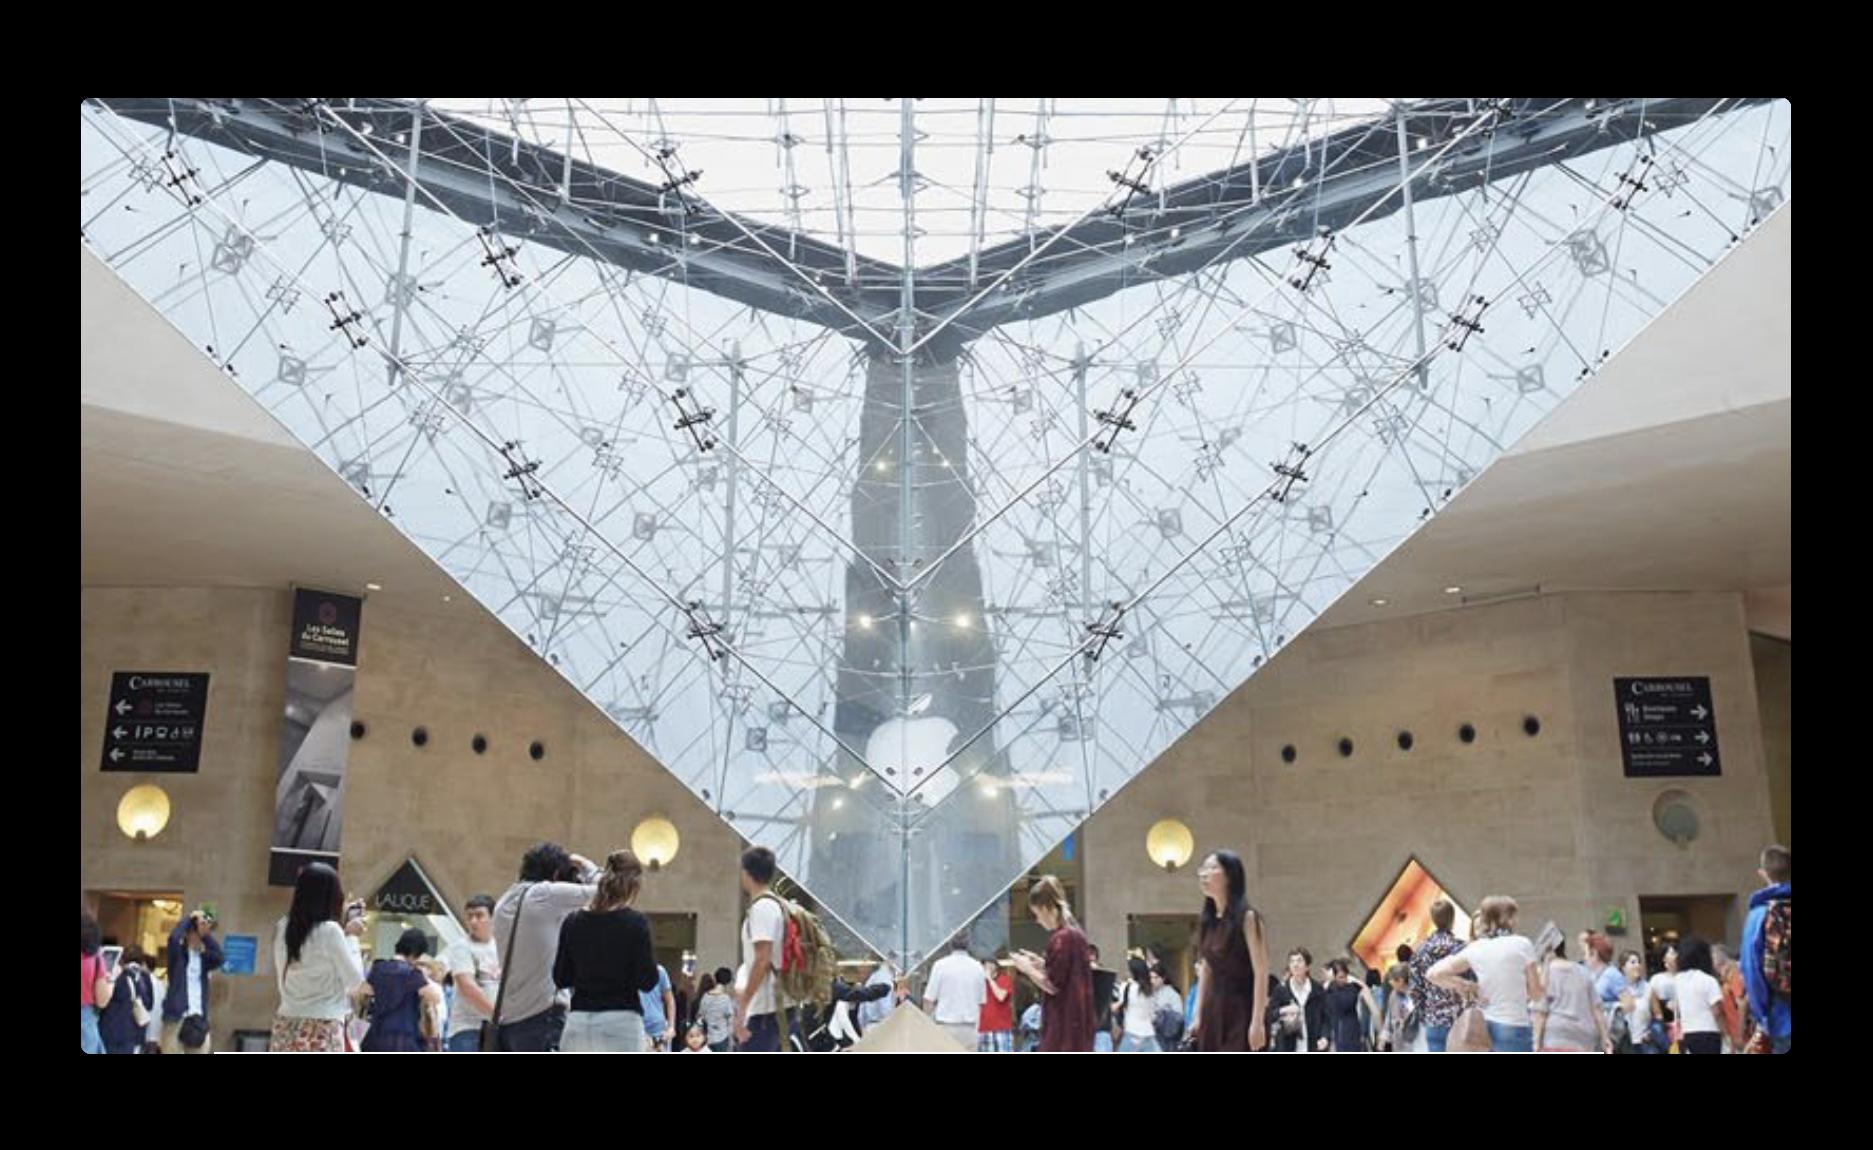 Apple、3月23日パリの開発者向けワークショップ開催に向けて招待状を発送